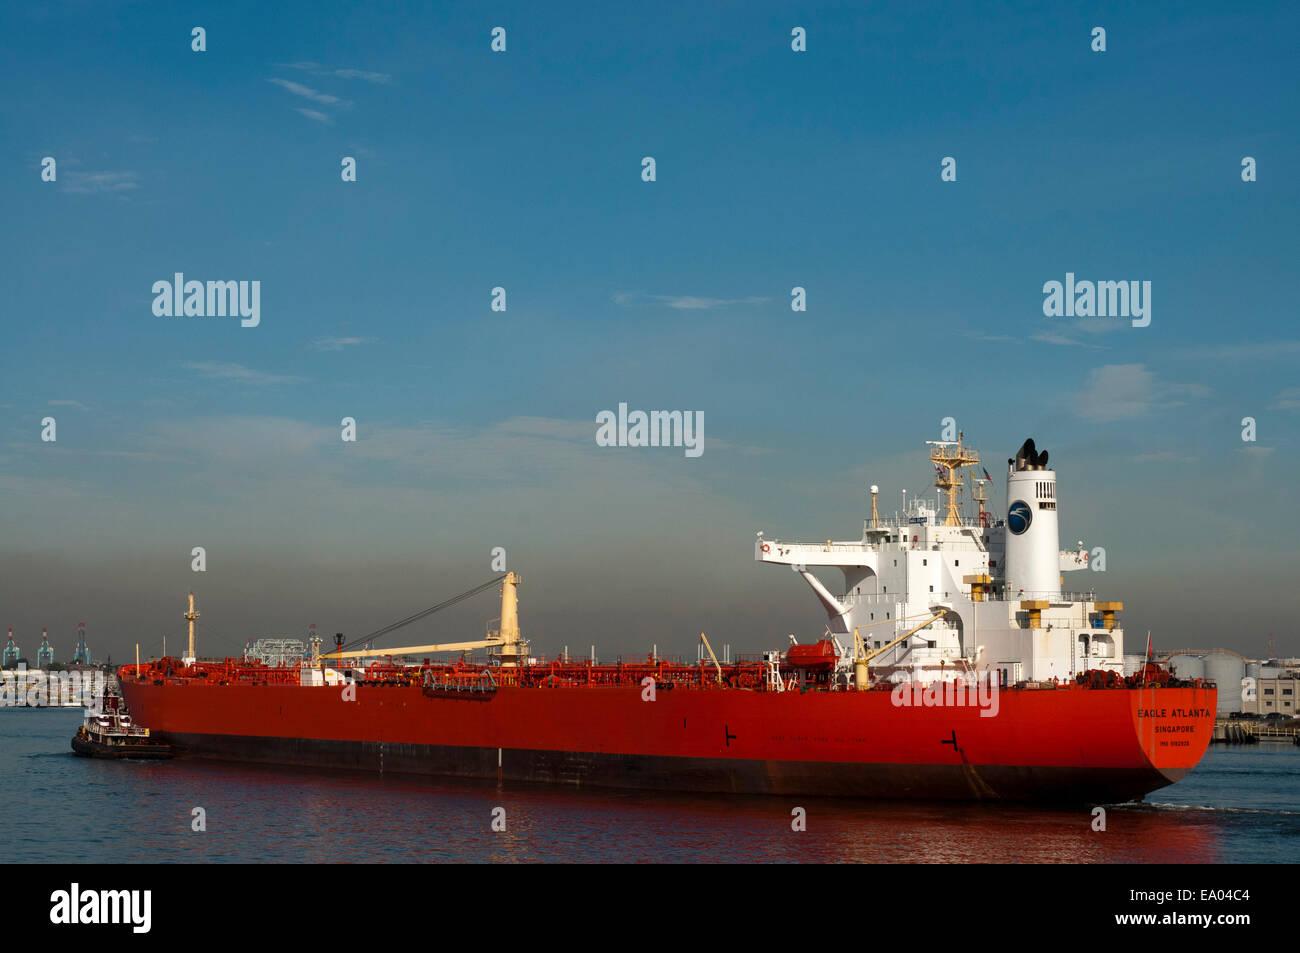 On leaving the Ferry Terminal. Staten Island. New York. USA. Eagle Atlanta Singapur ship. EAGLE ATLANTA (Crude oil - Stock Image